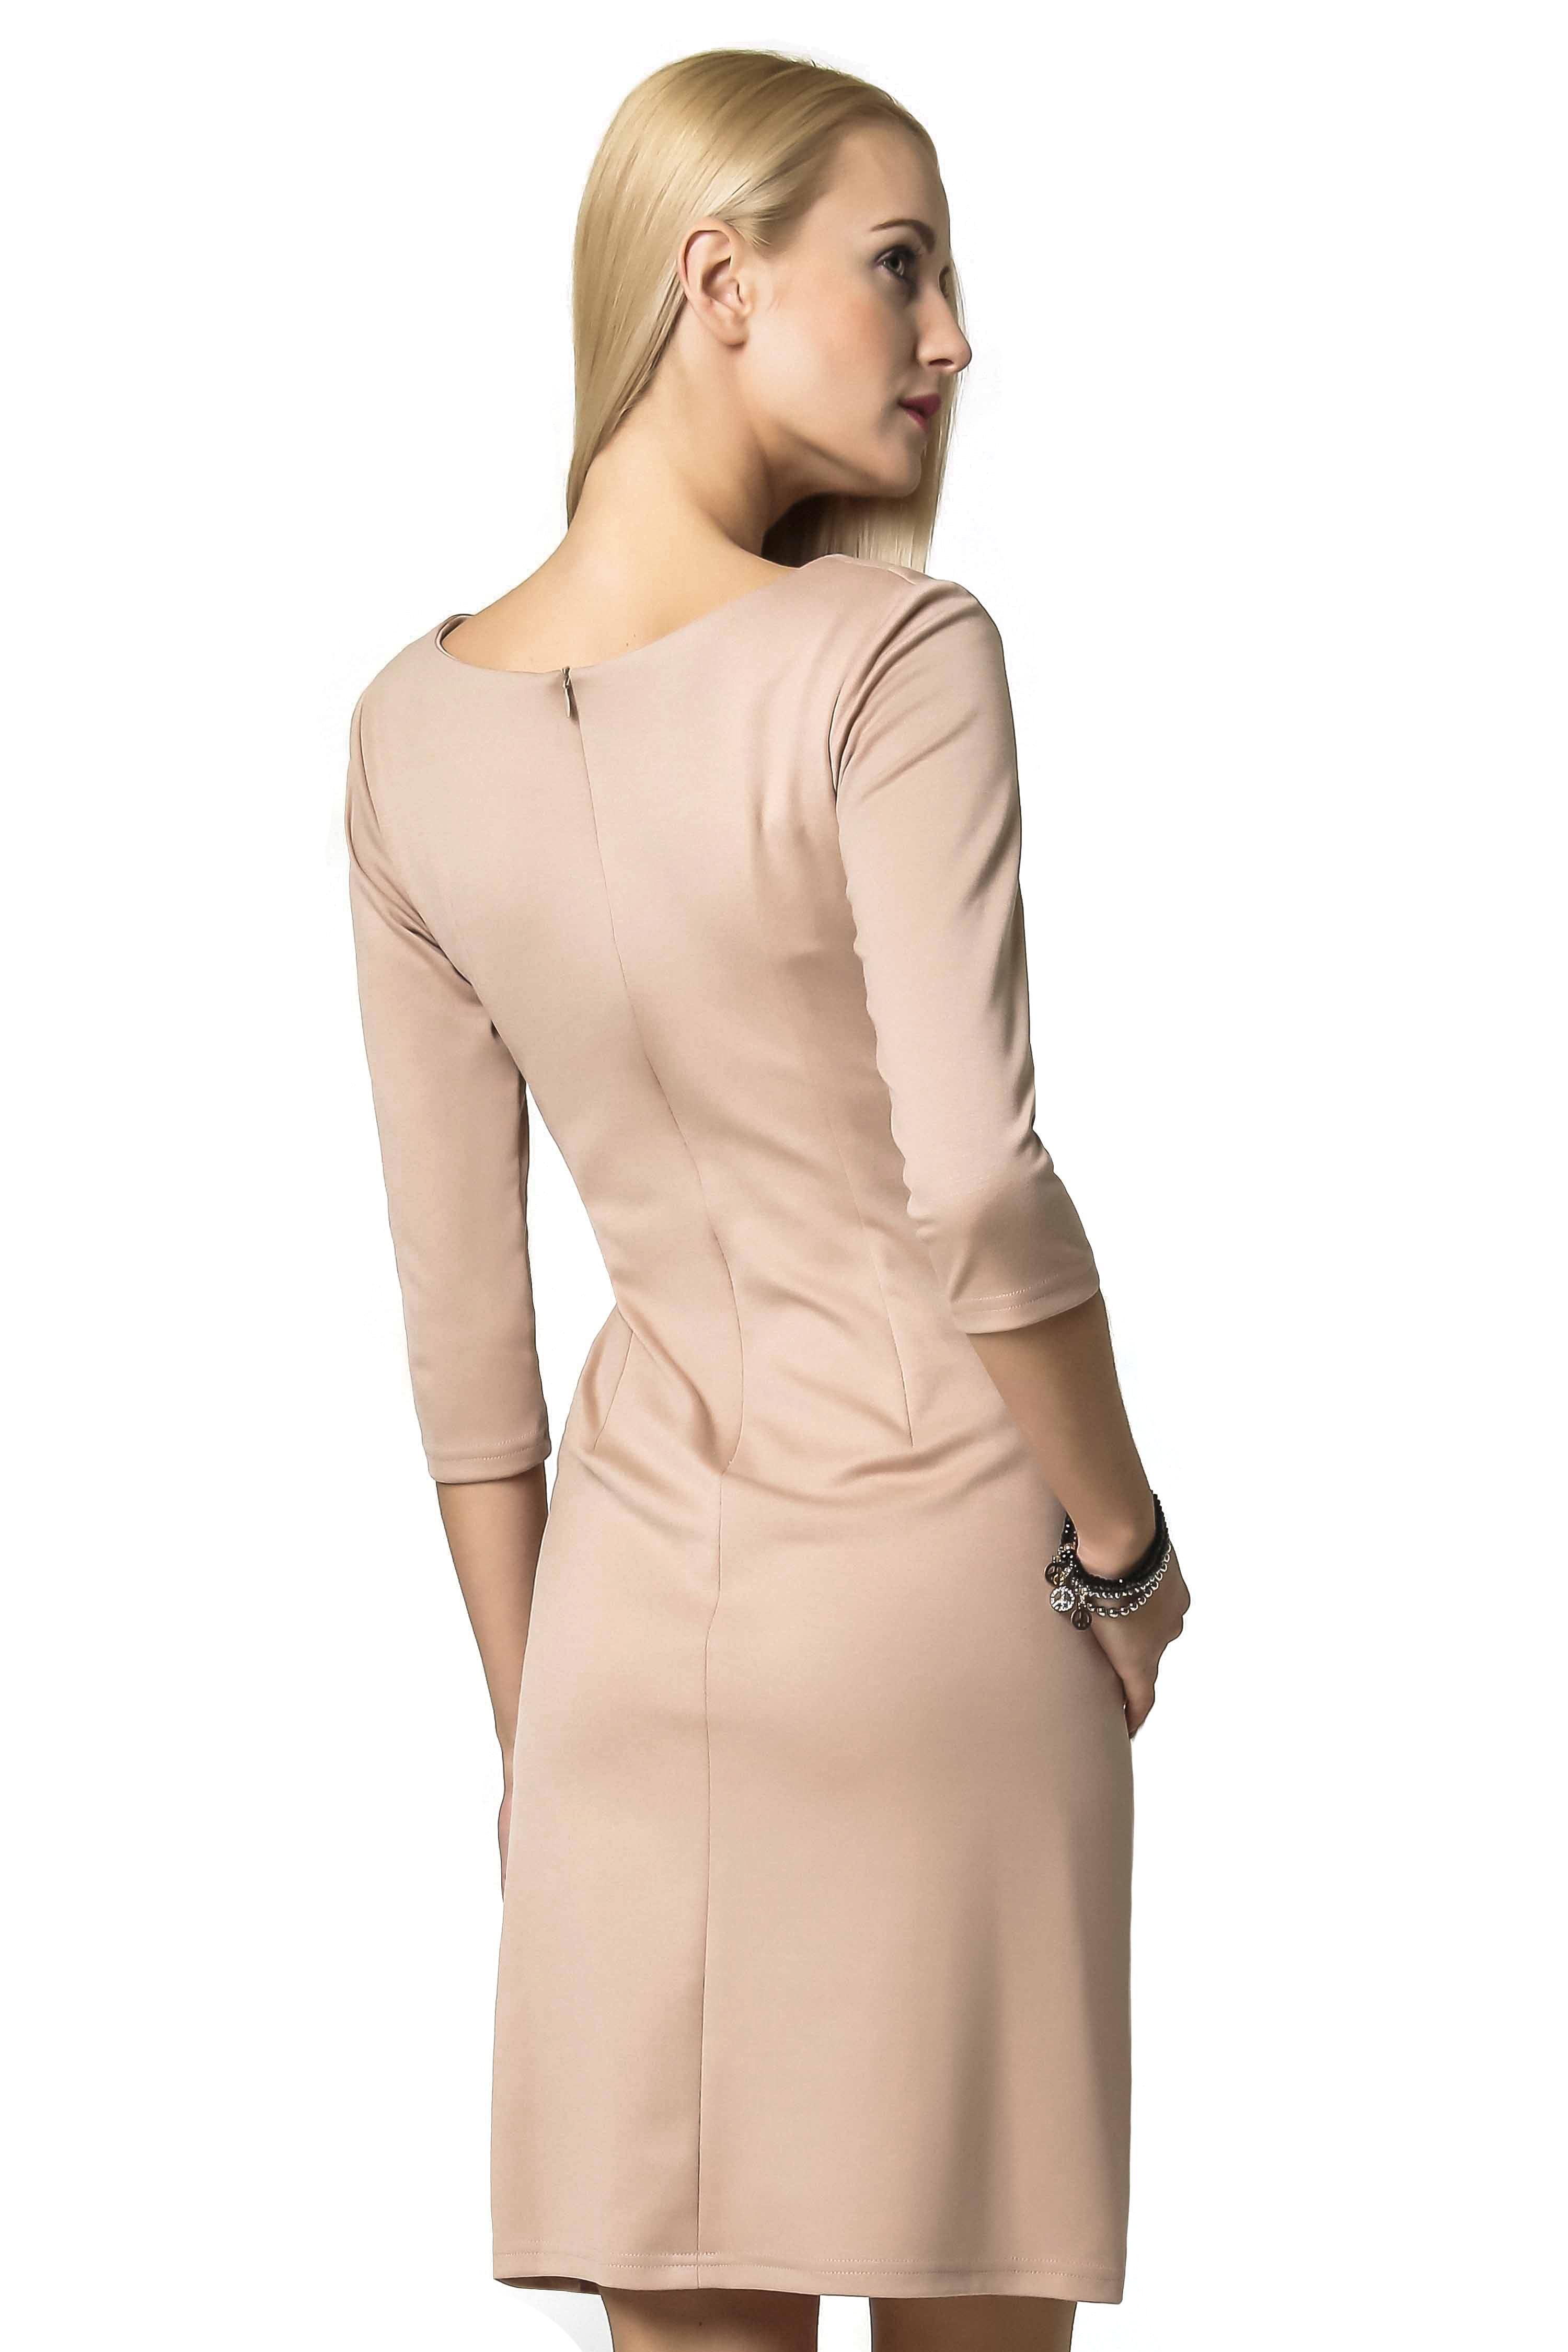 Tanya dress in beige